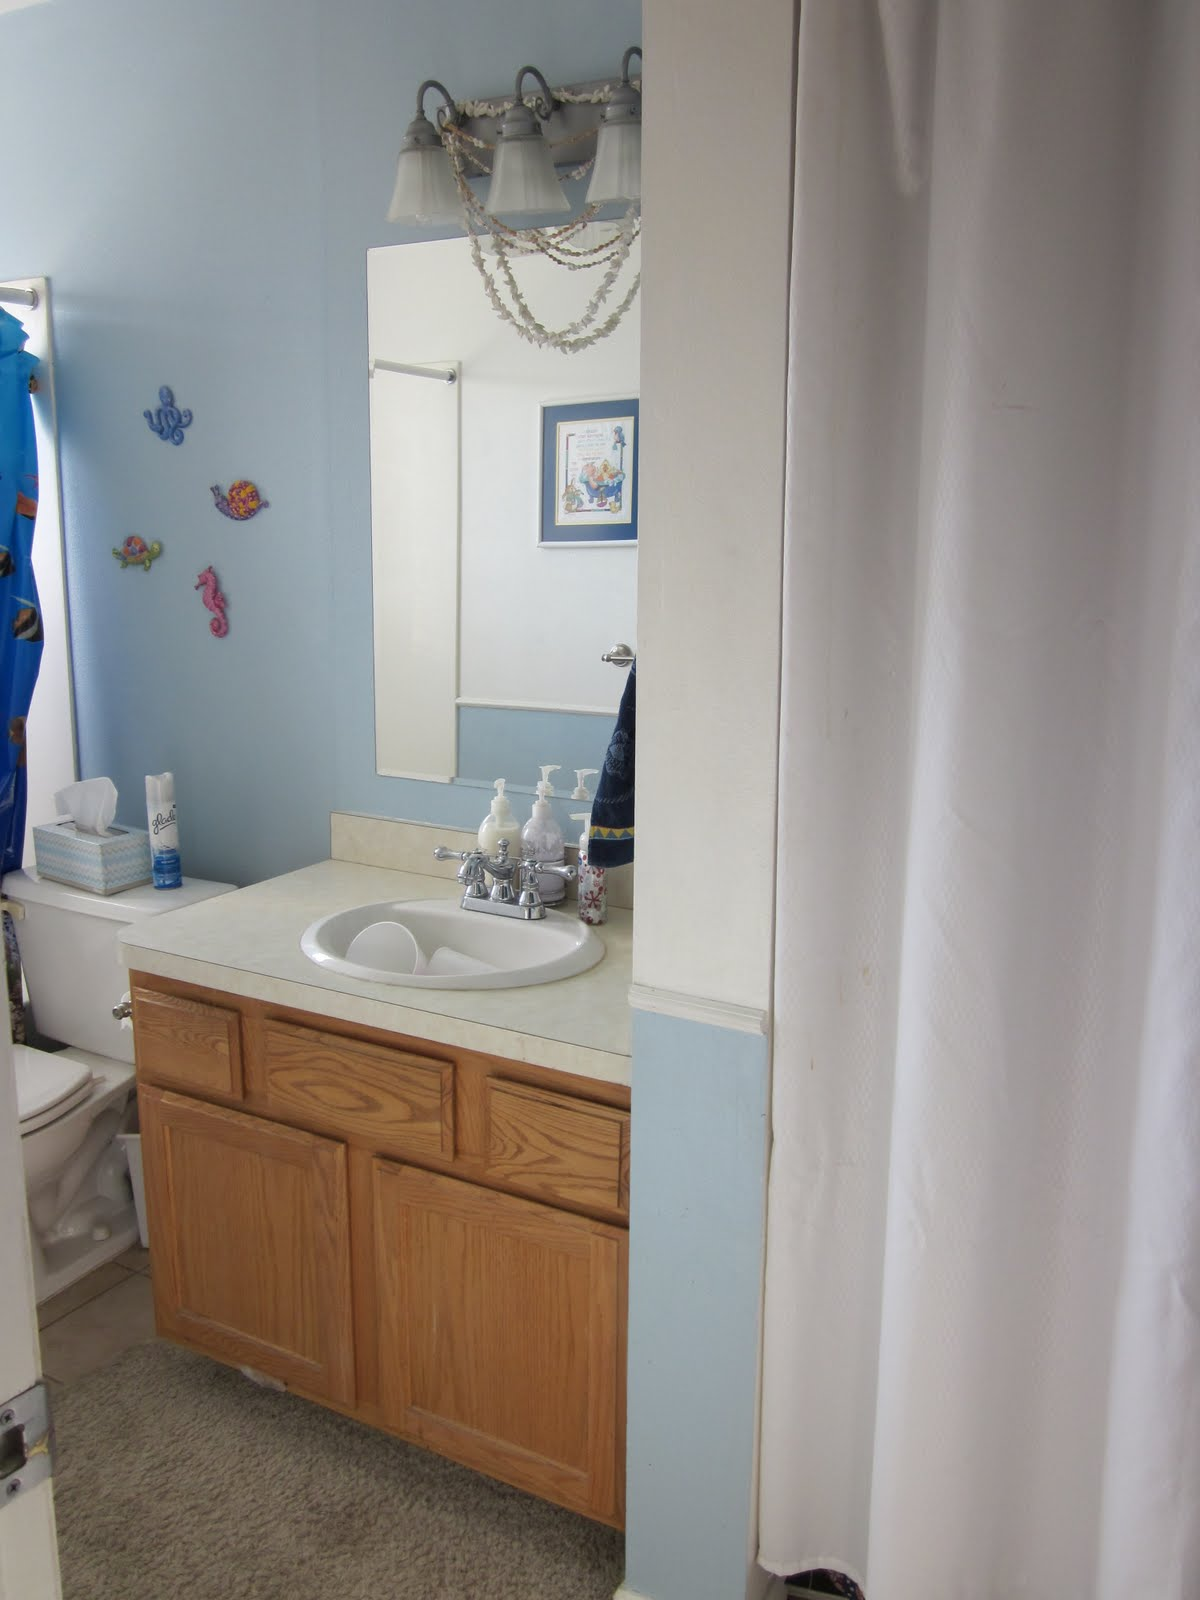 Brown bathroom shower curtains - Light Blue Bathroom With Light Blue Paint